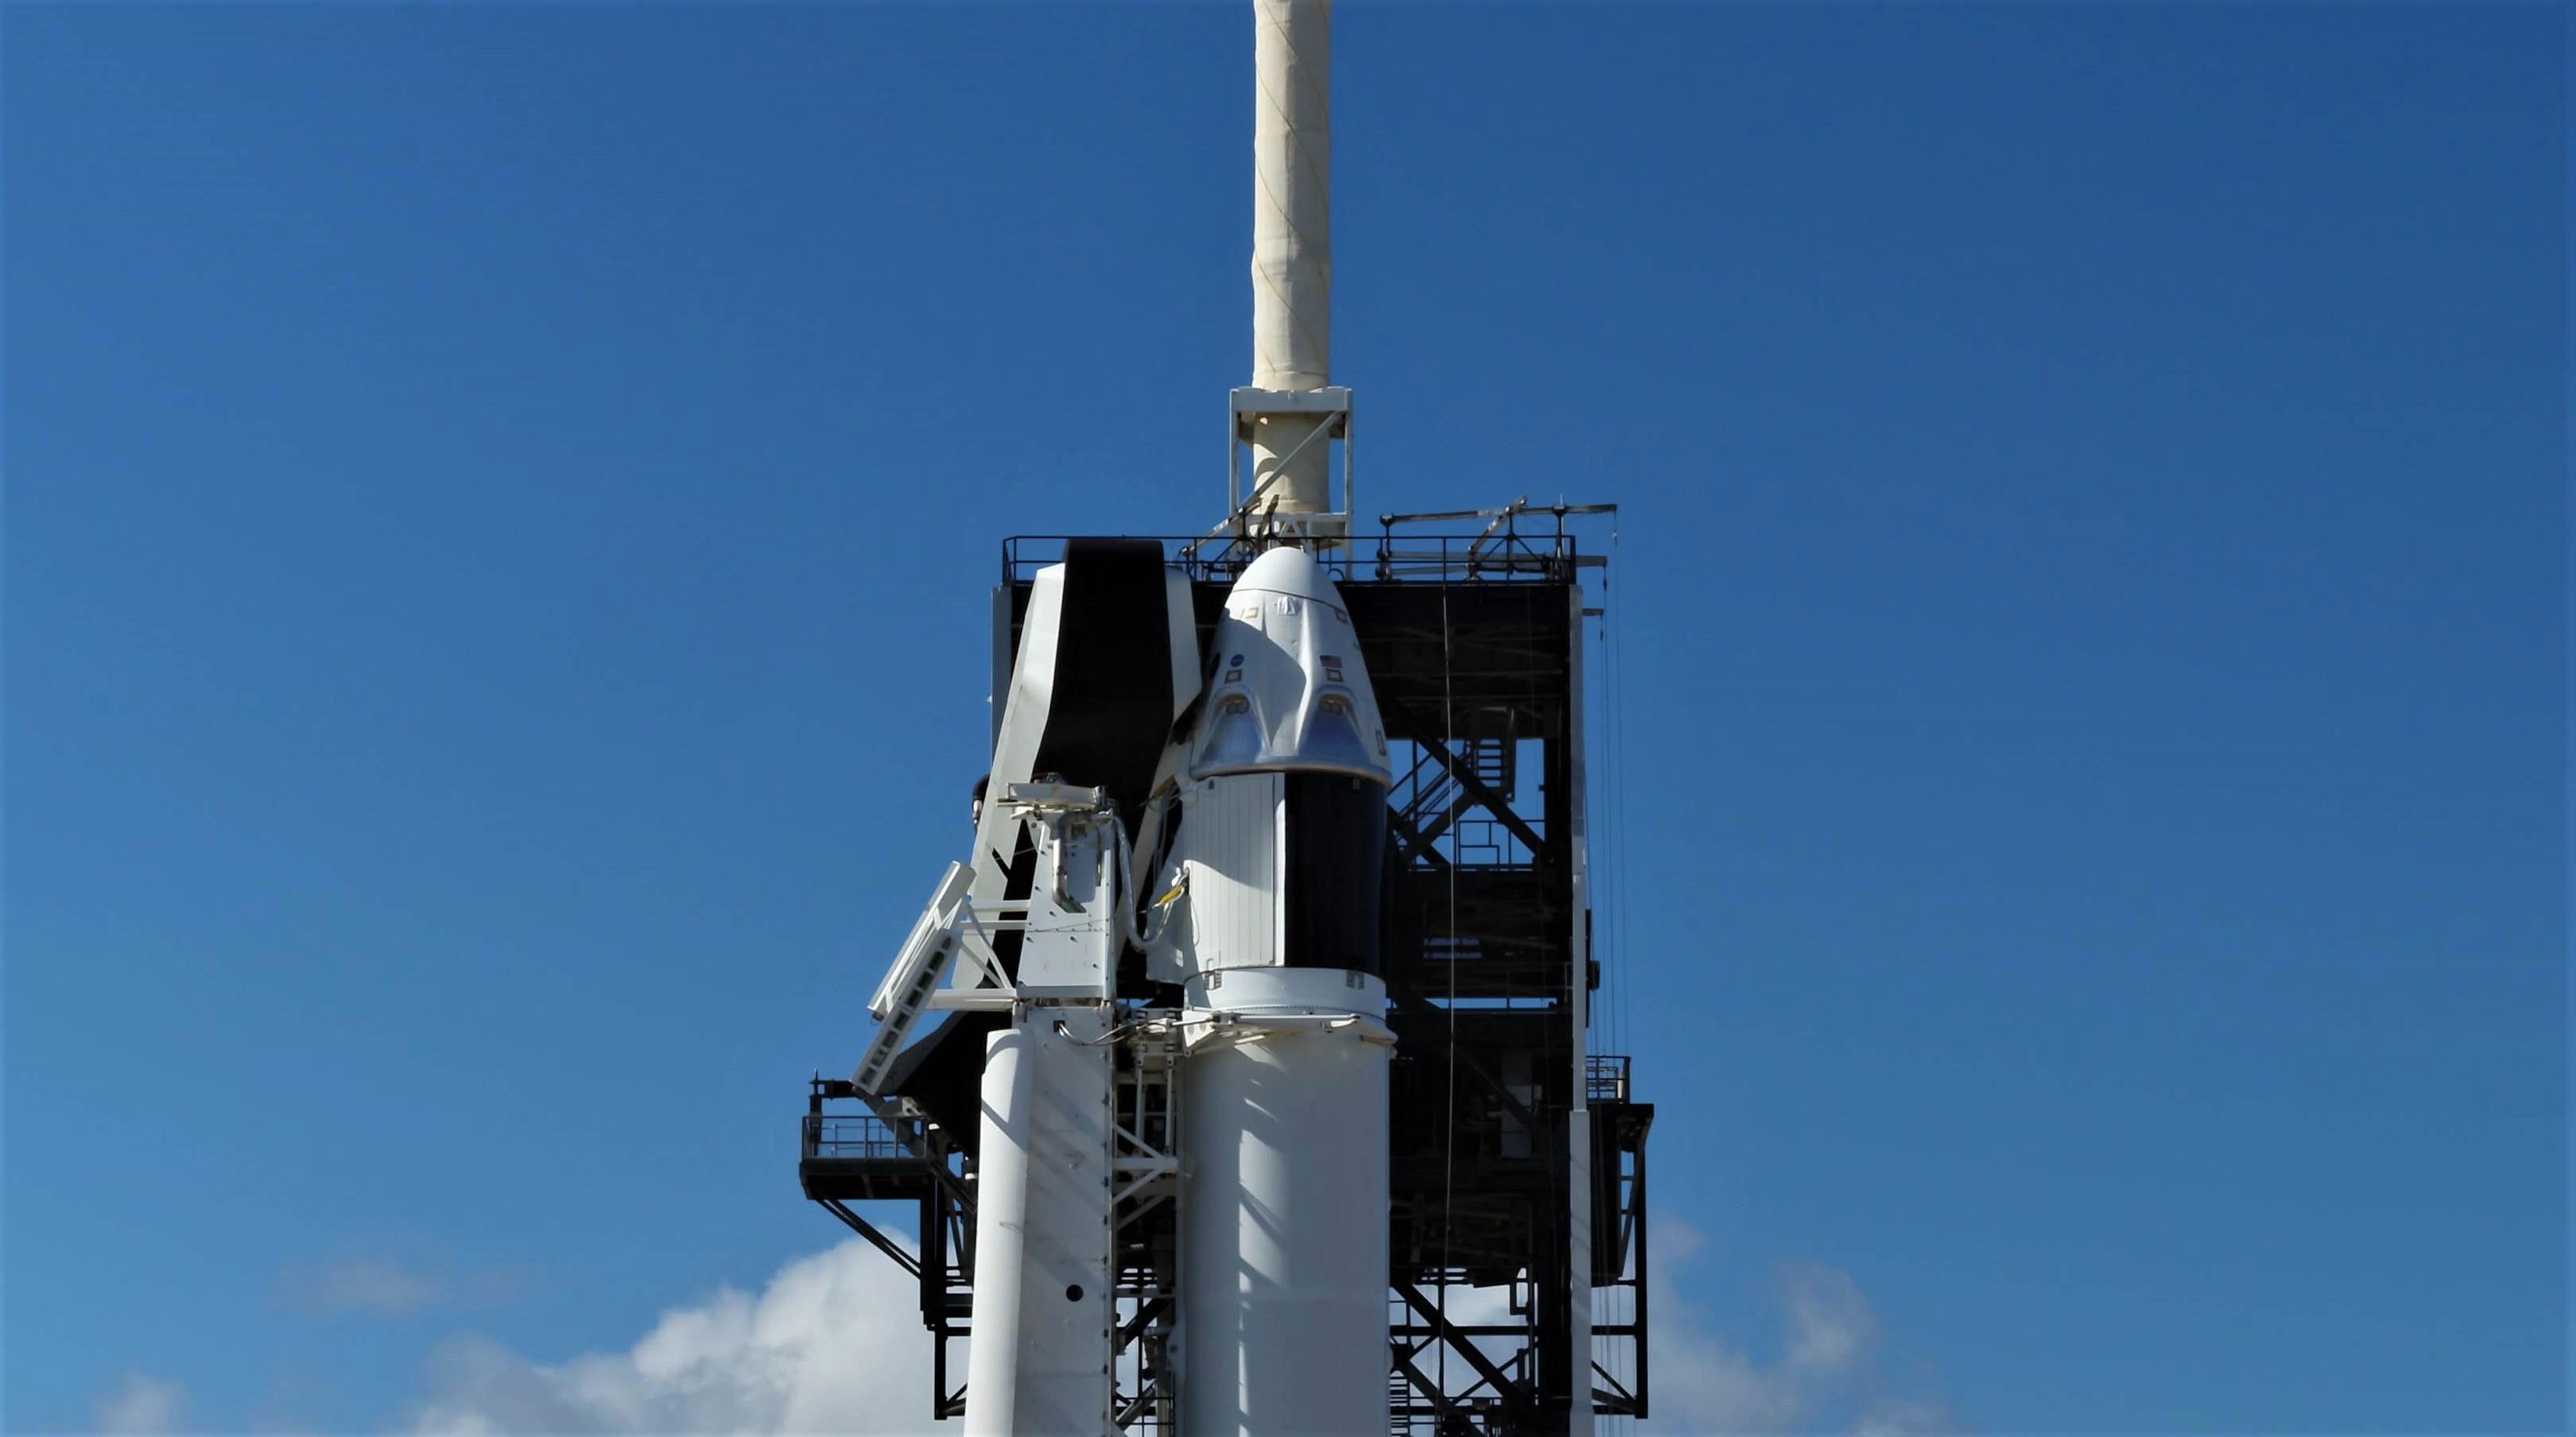 Crew Dragon Falcon 9 DM-1 vertical 39A (SpaceX) 12